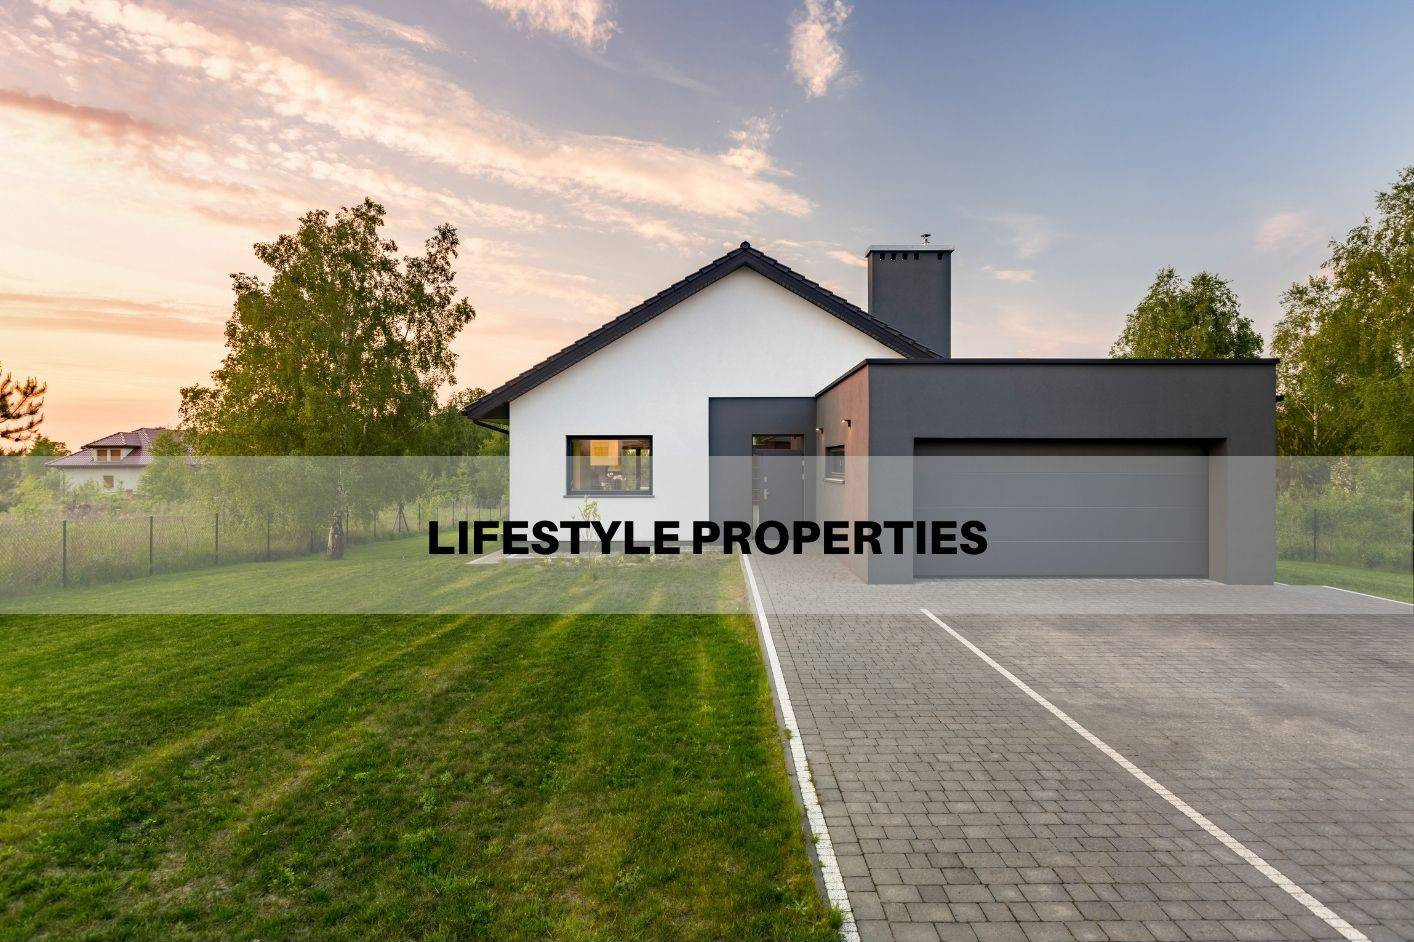 Rural Mansion Lifestyle Properties.jpg